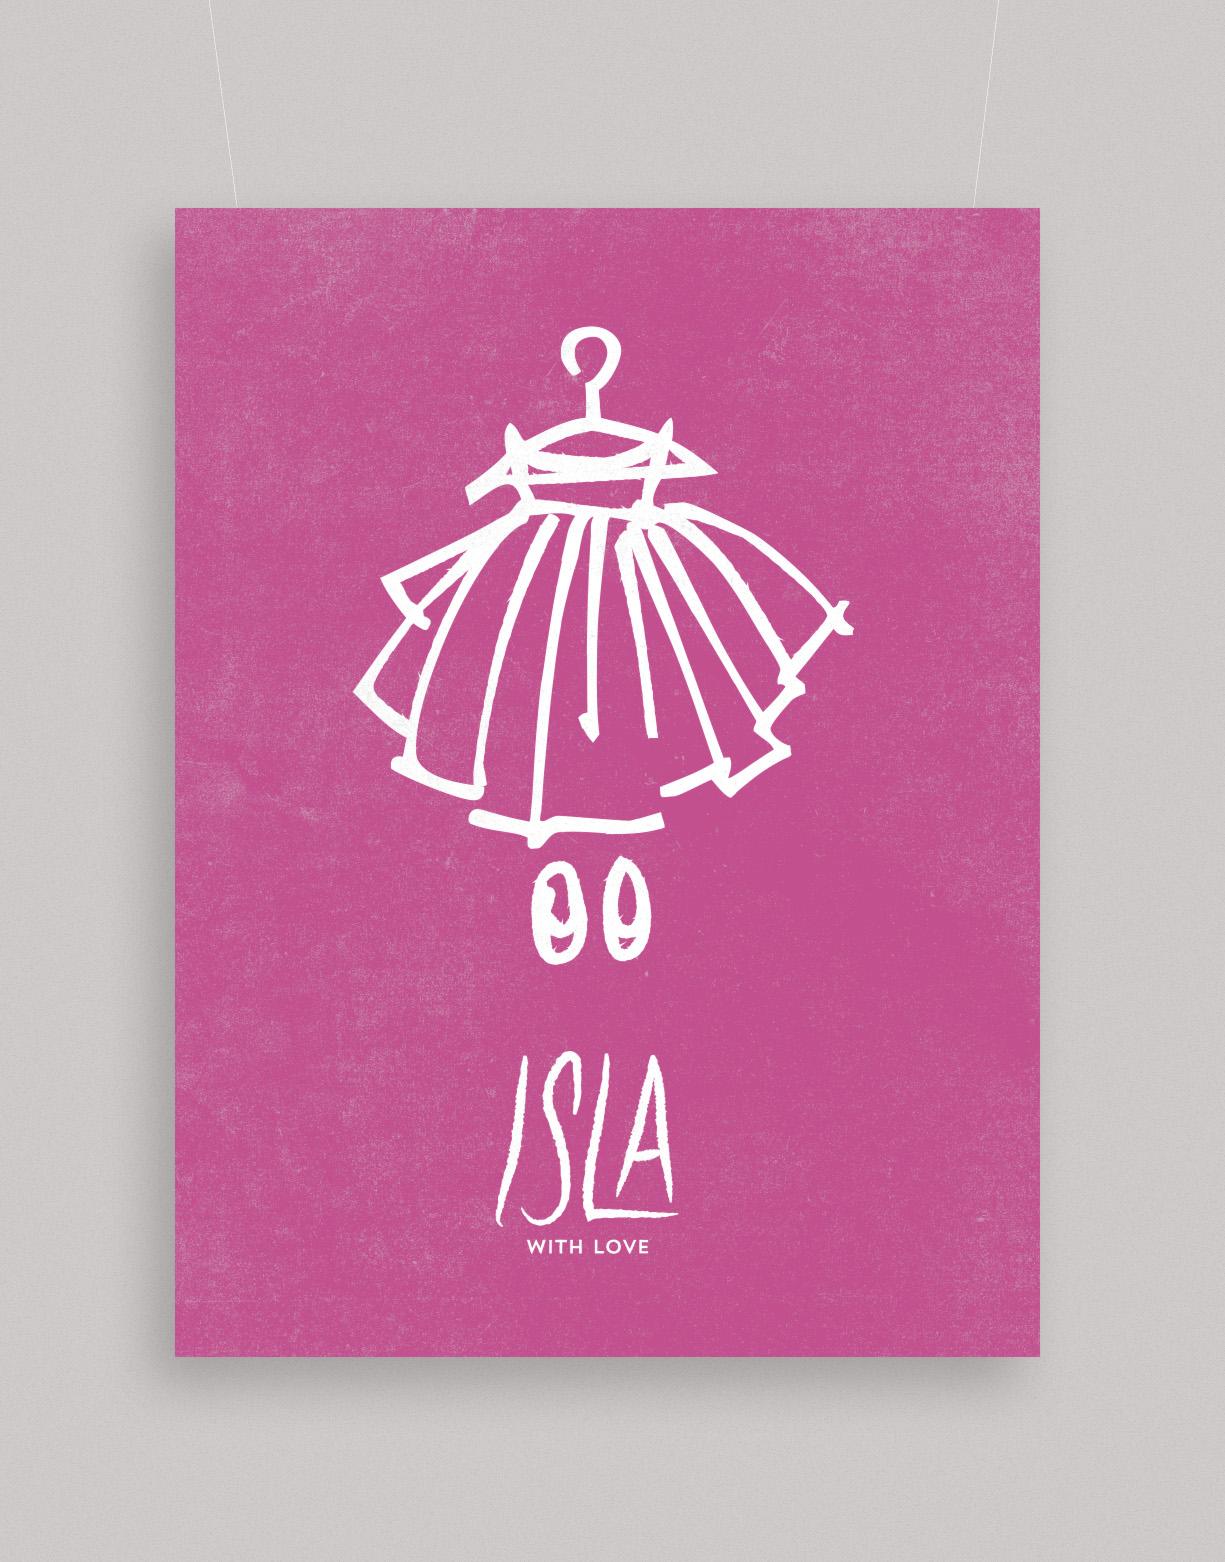 Posters_Isla 01.jpg